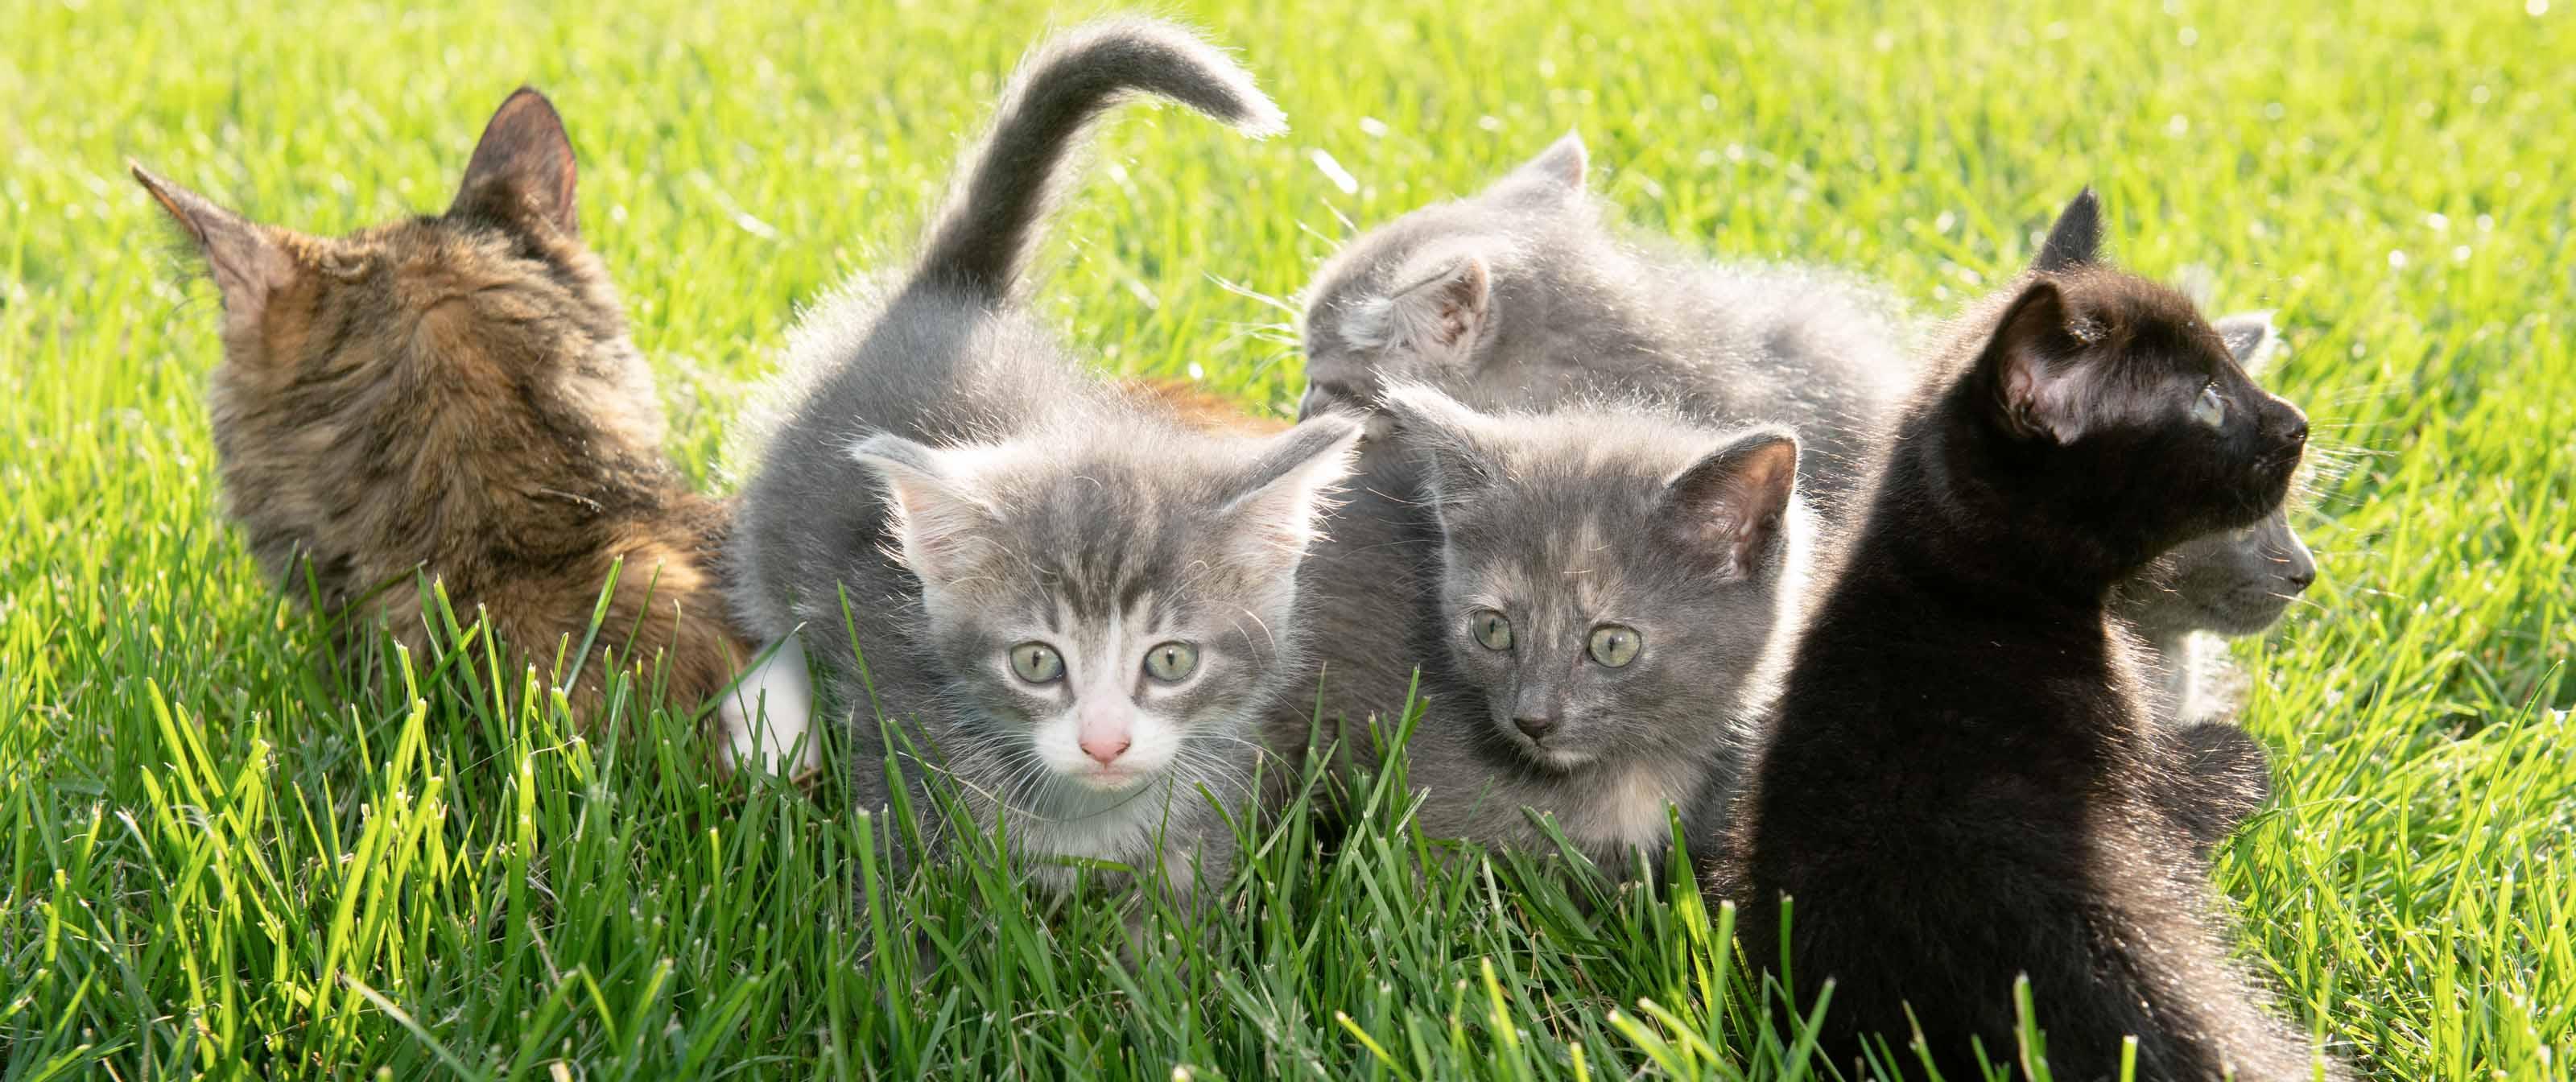 Header image of animals.